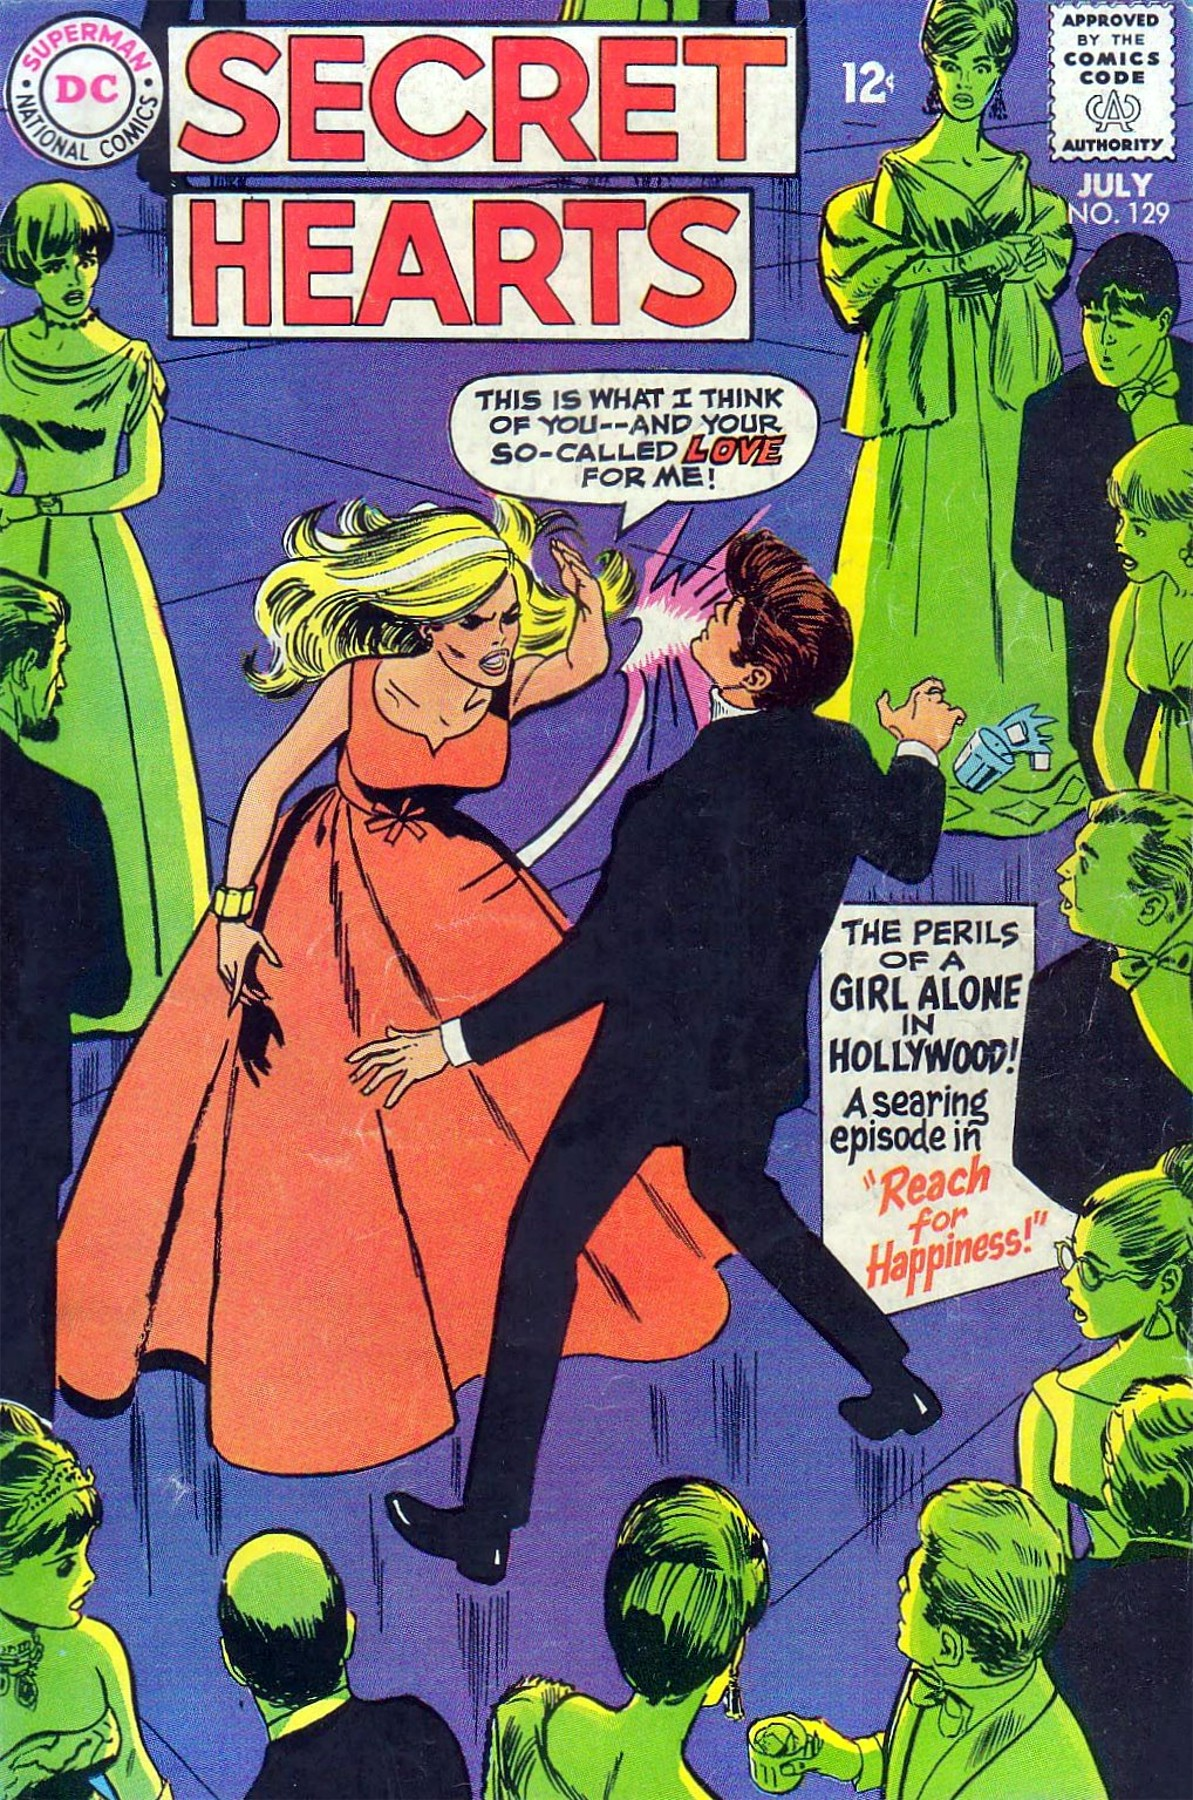 Read online Secret Hearts comic -  Issue #129 - 1